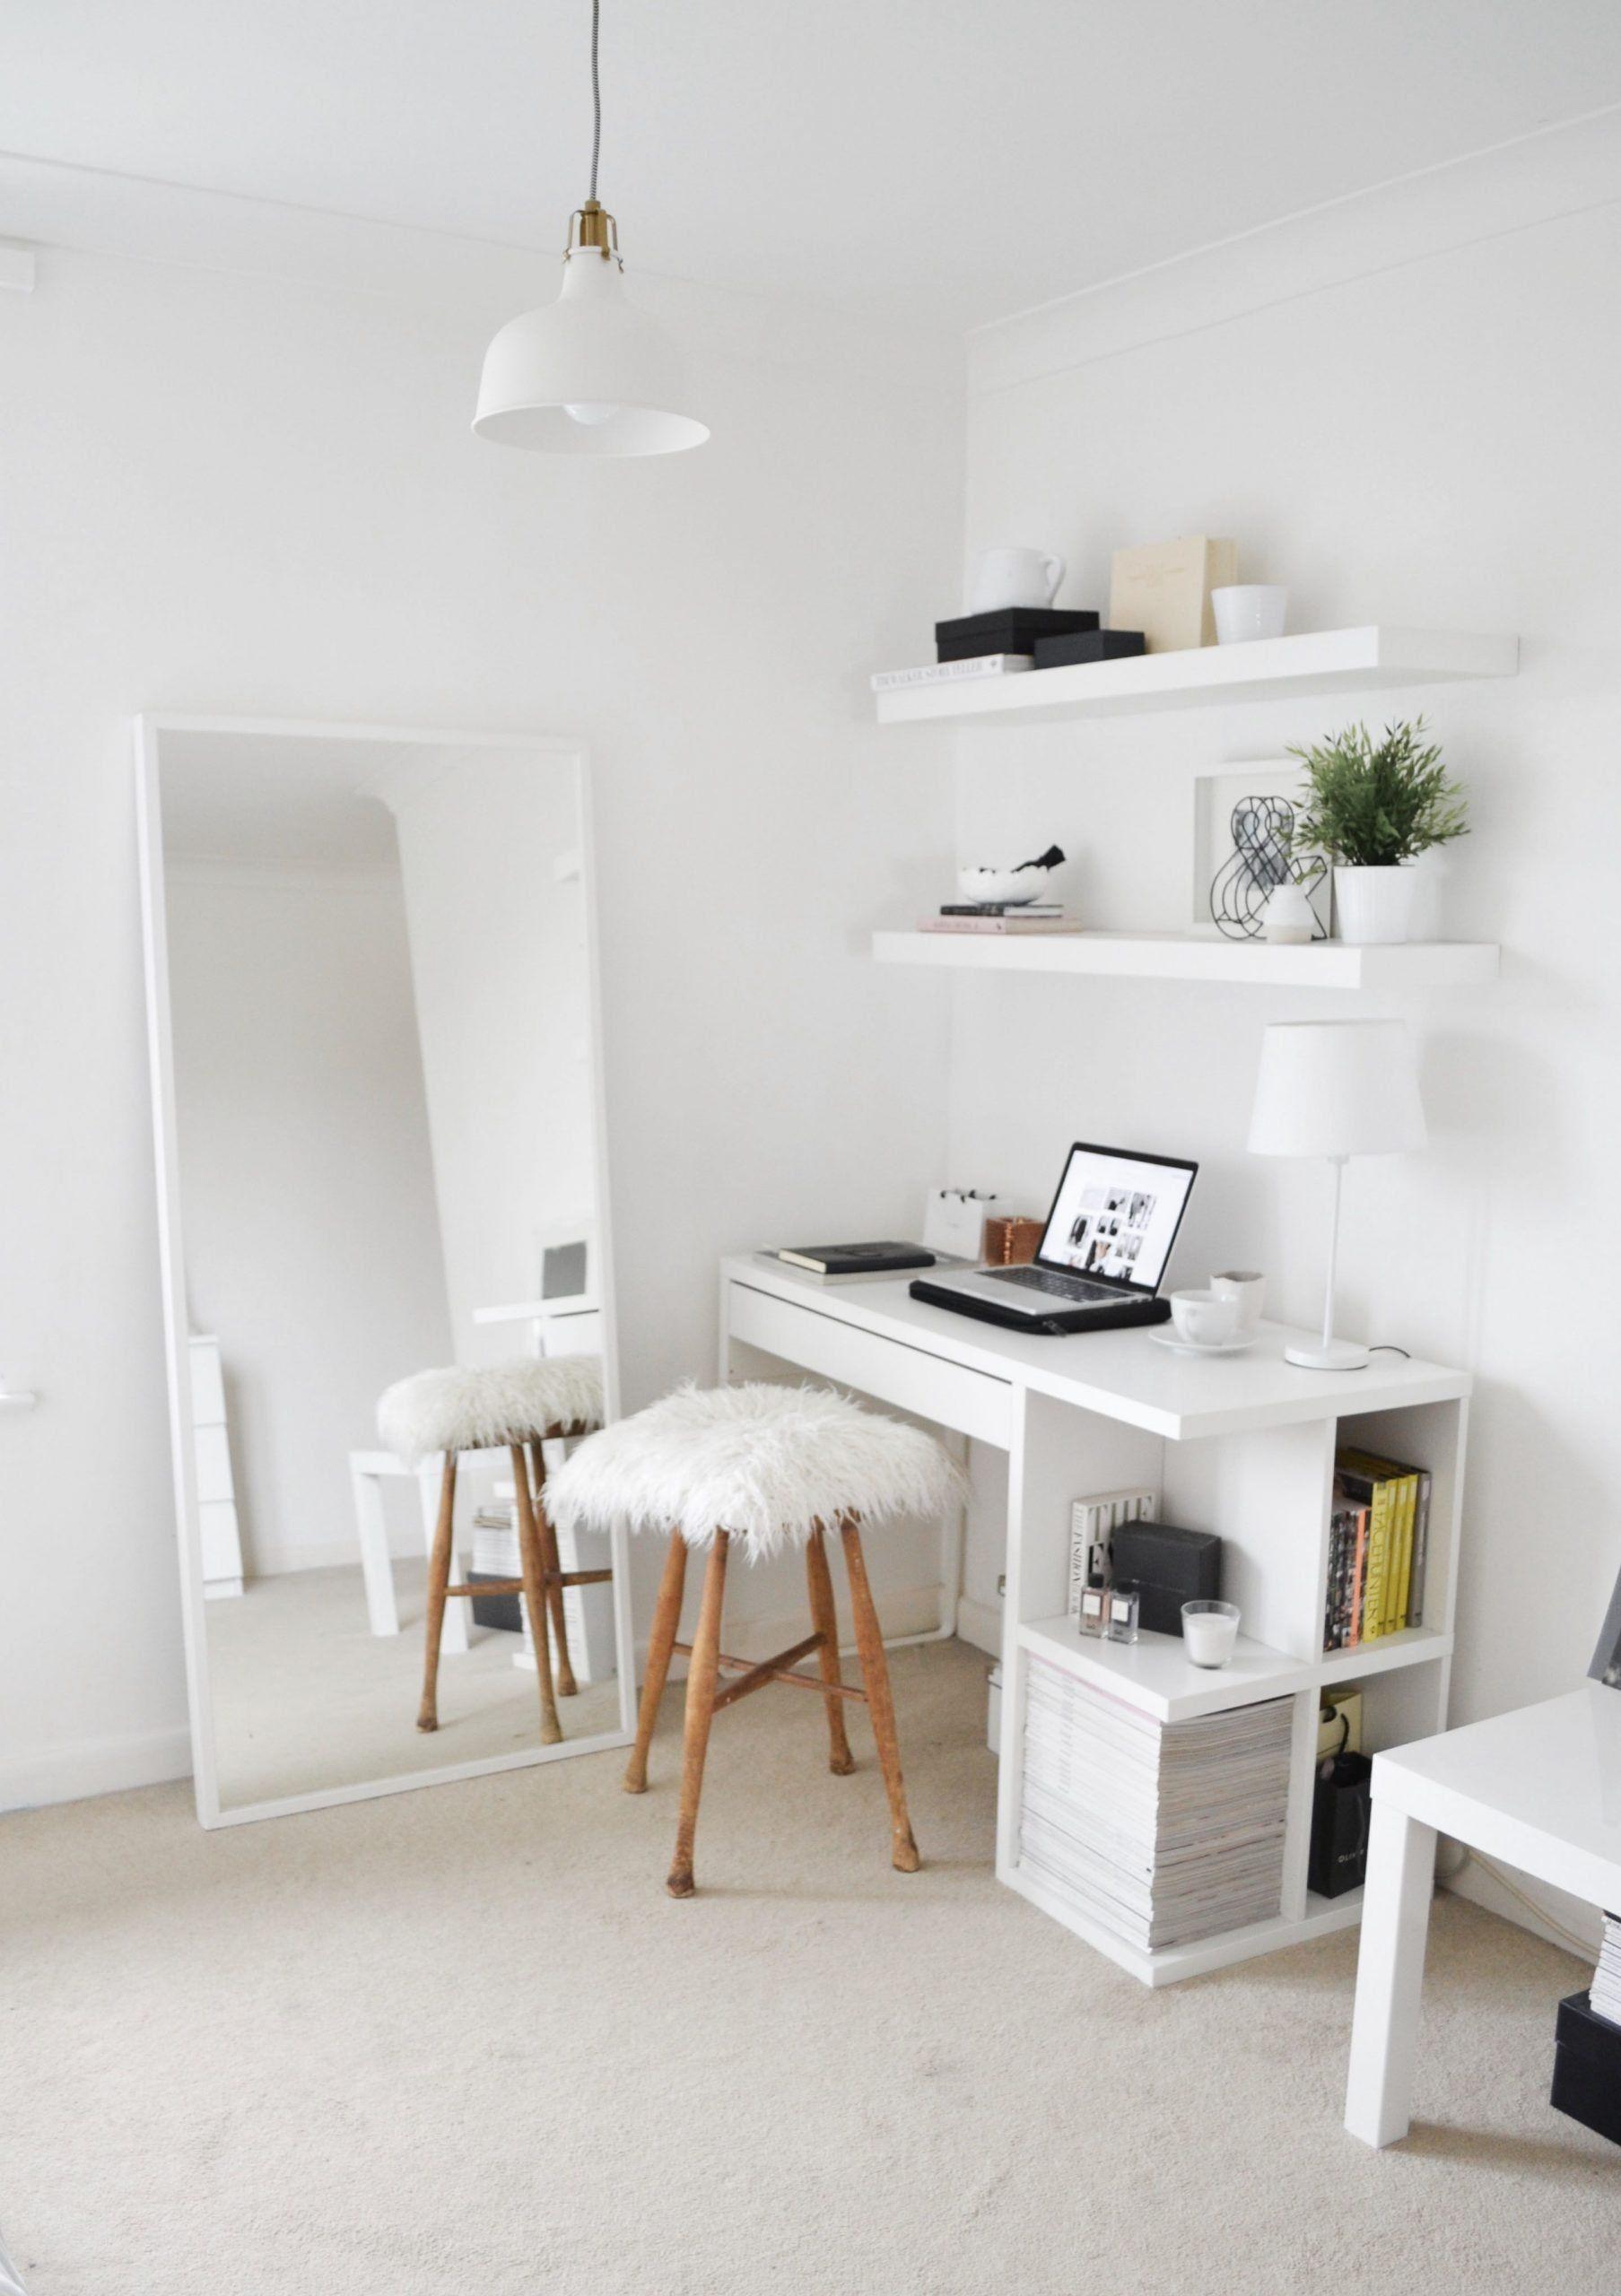 Ikea White Bedroom Furniture Minimal Bedroom Interior Styling